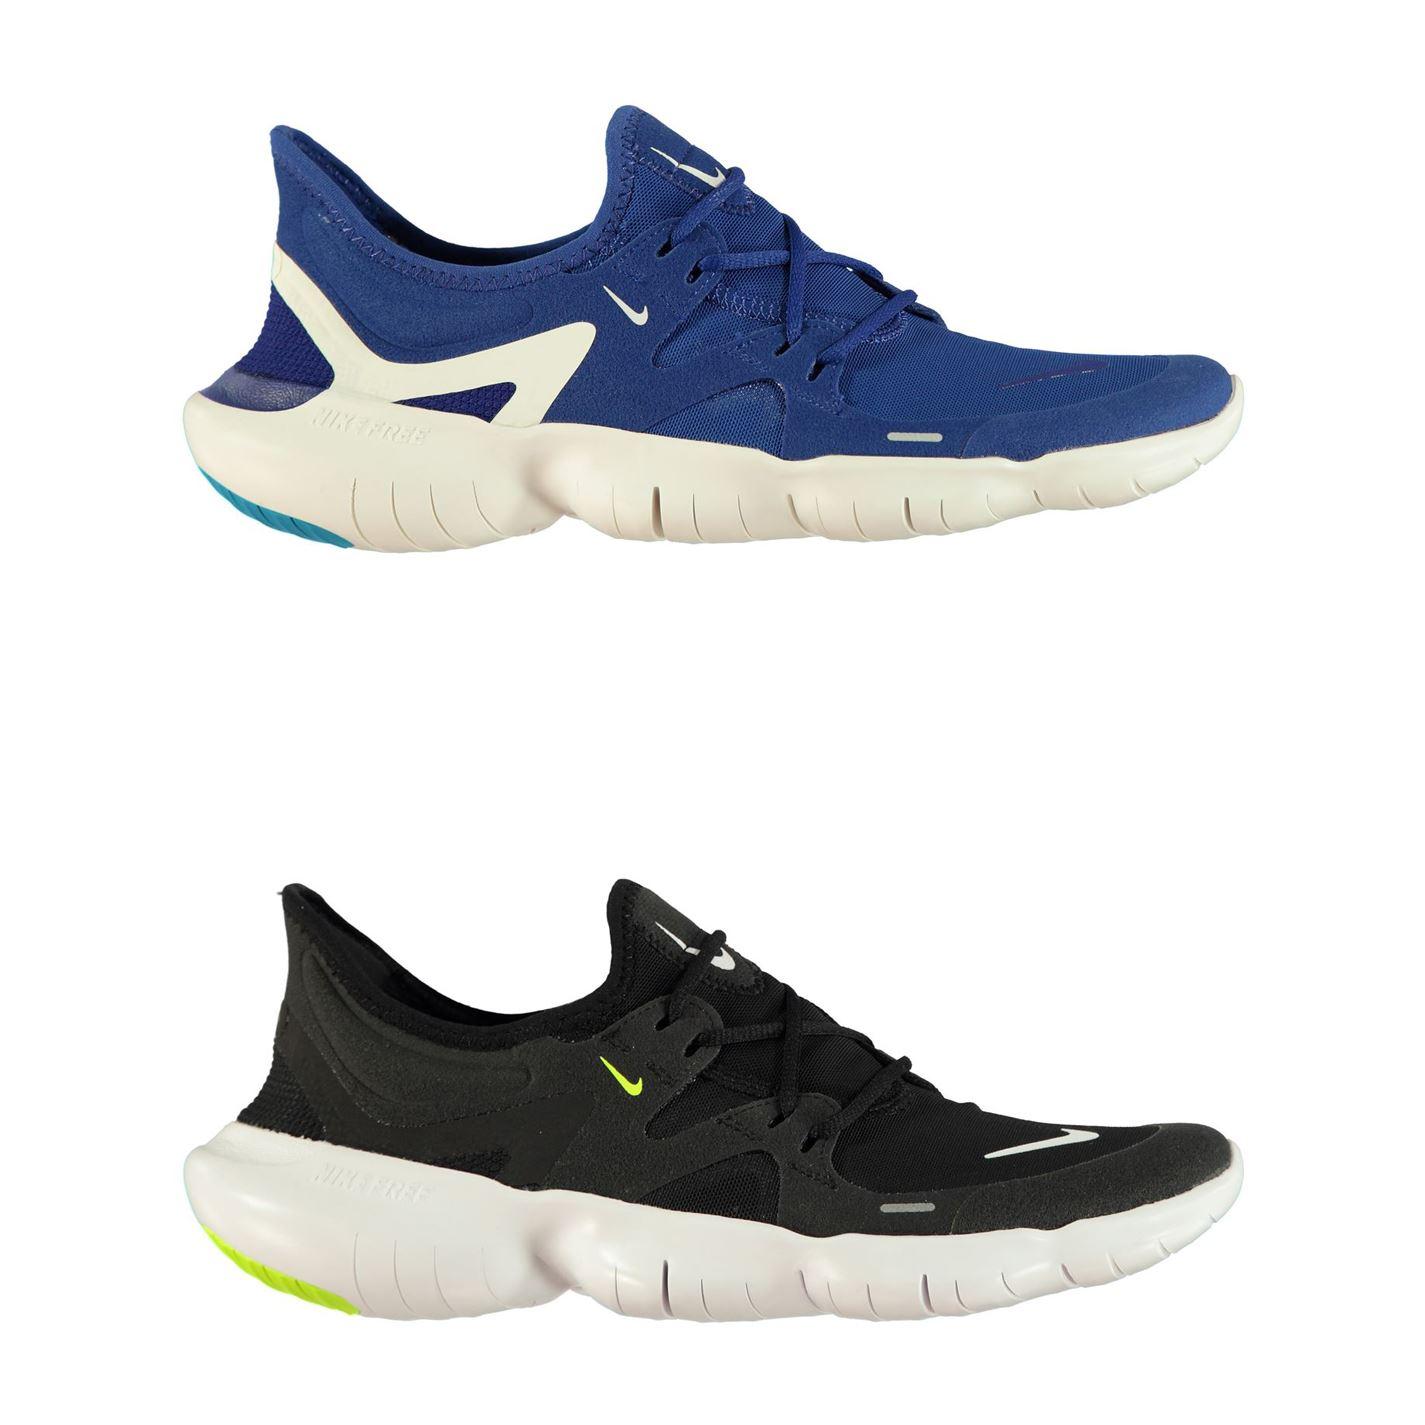 buy online c5313 487fa Nike Free Run 5.0 Mens Running Shoes Trainers Footwear ...